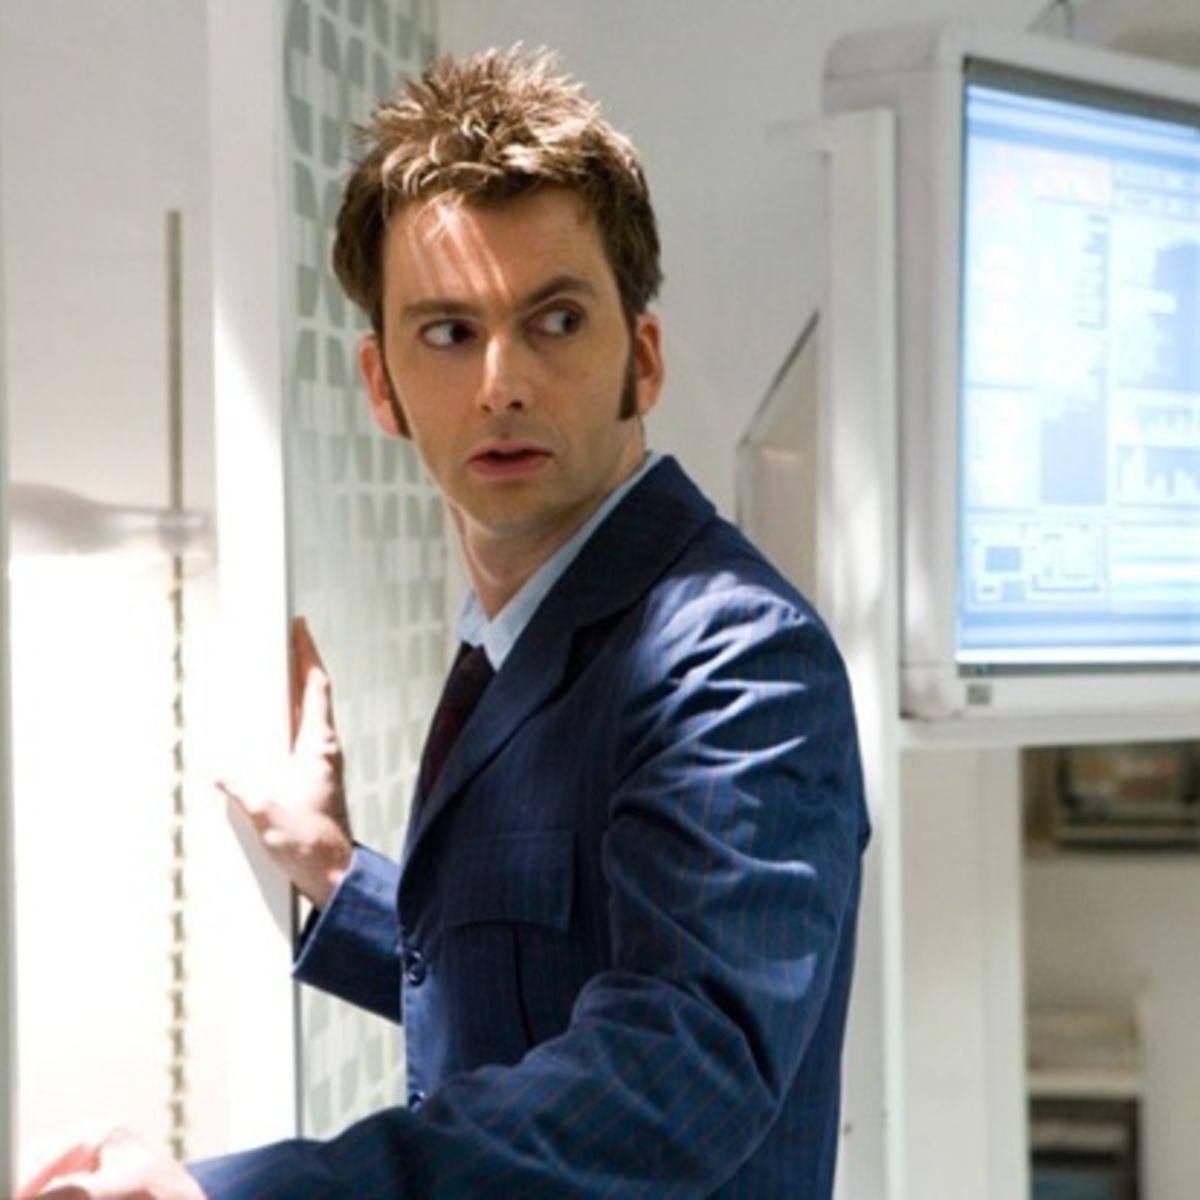 Doctor_Who_DavidTennant.jpg